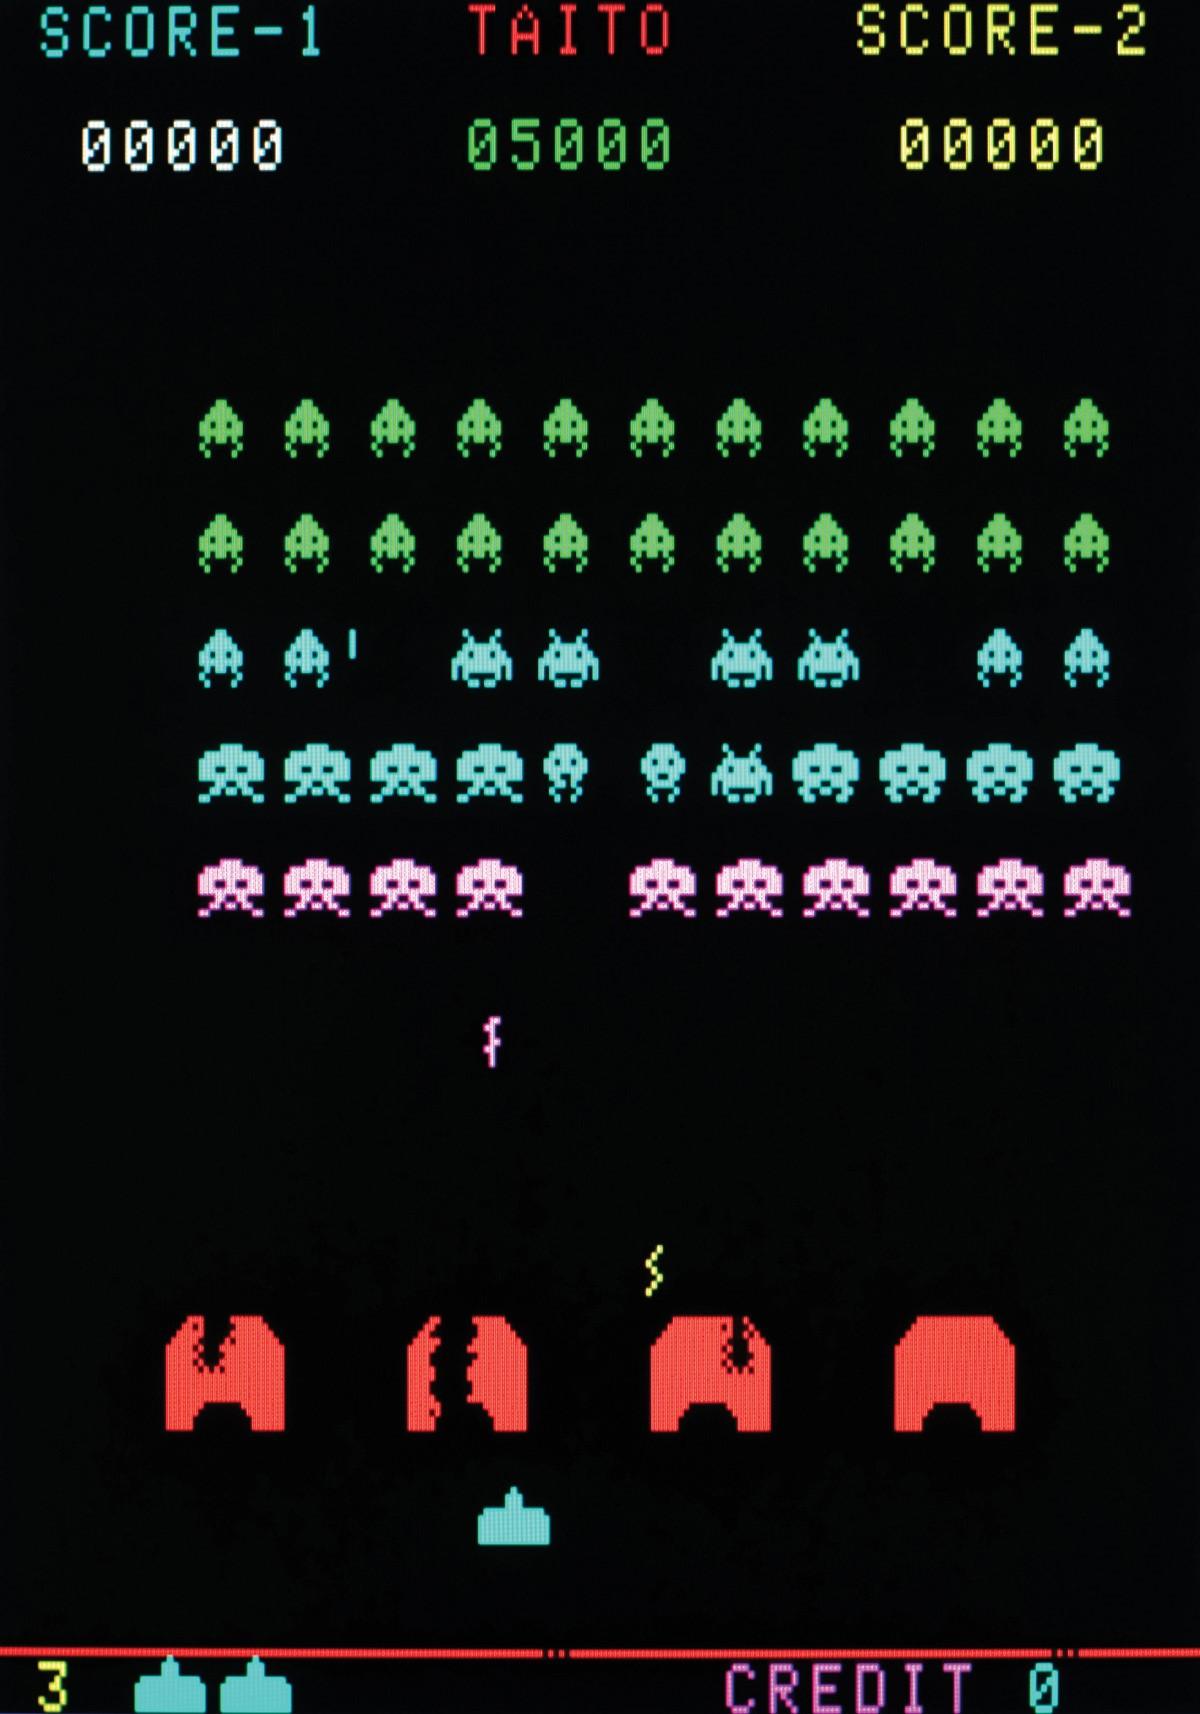 Arcade Game 1980s List